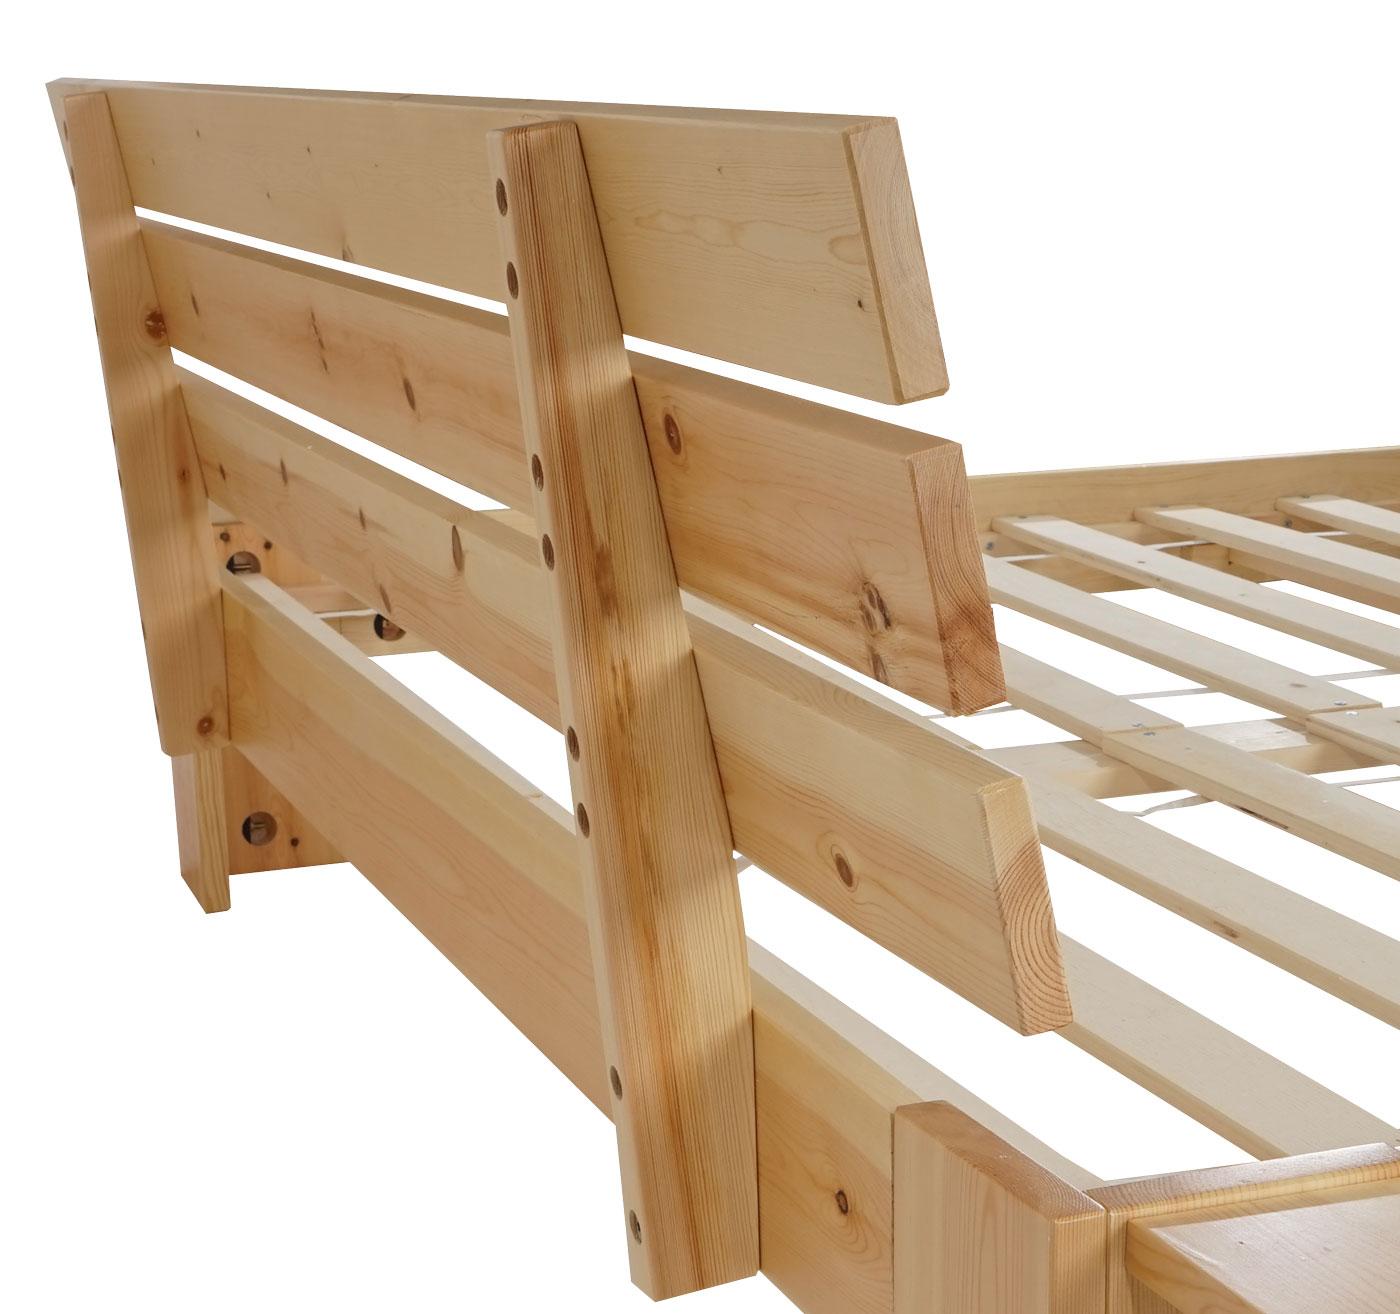 bett perth jugendbett massivholz inkl lattenrost ablage kiefer 140x200cm natur lackiert. Black Bedroom Furniture Sets. Home Design Ideas